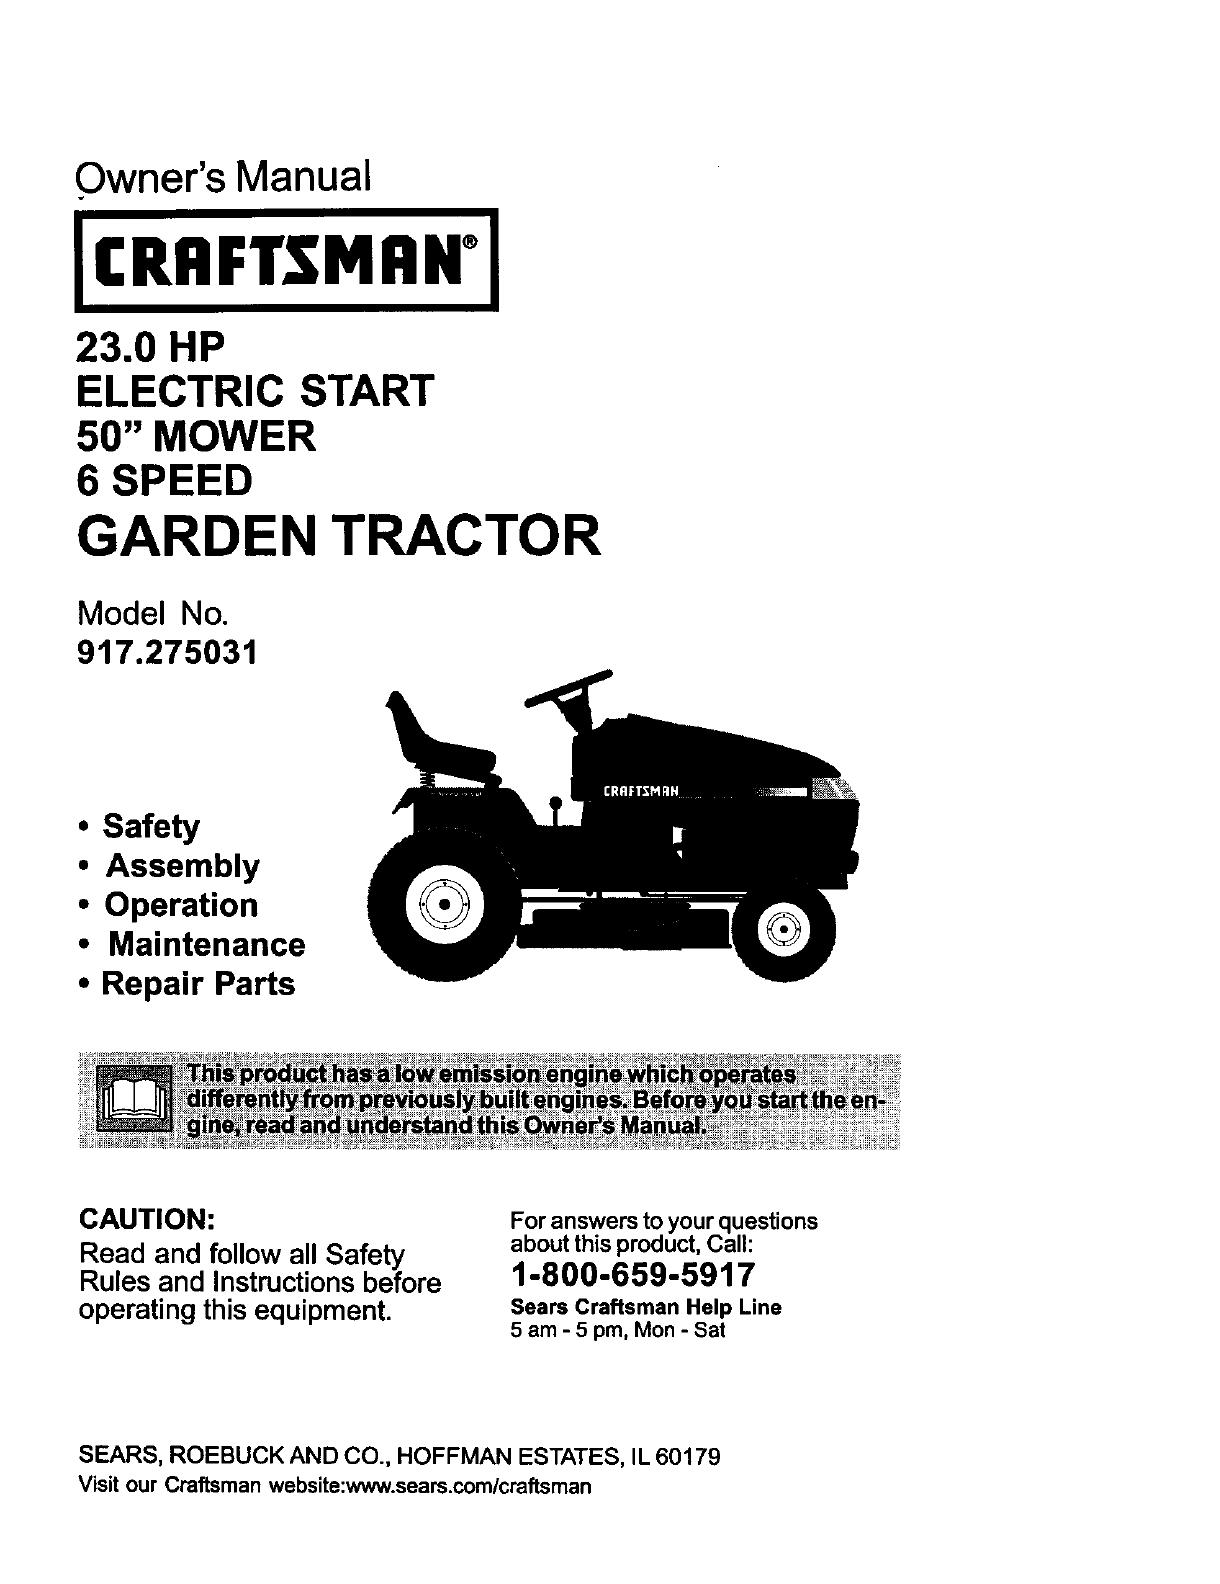 Craftsman 23 0 Hp 917 275031 Users Manual